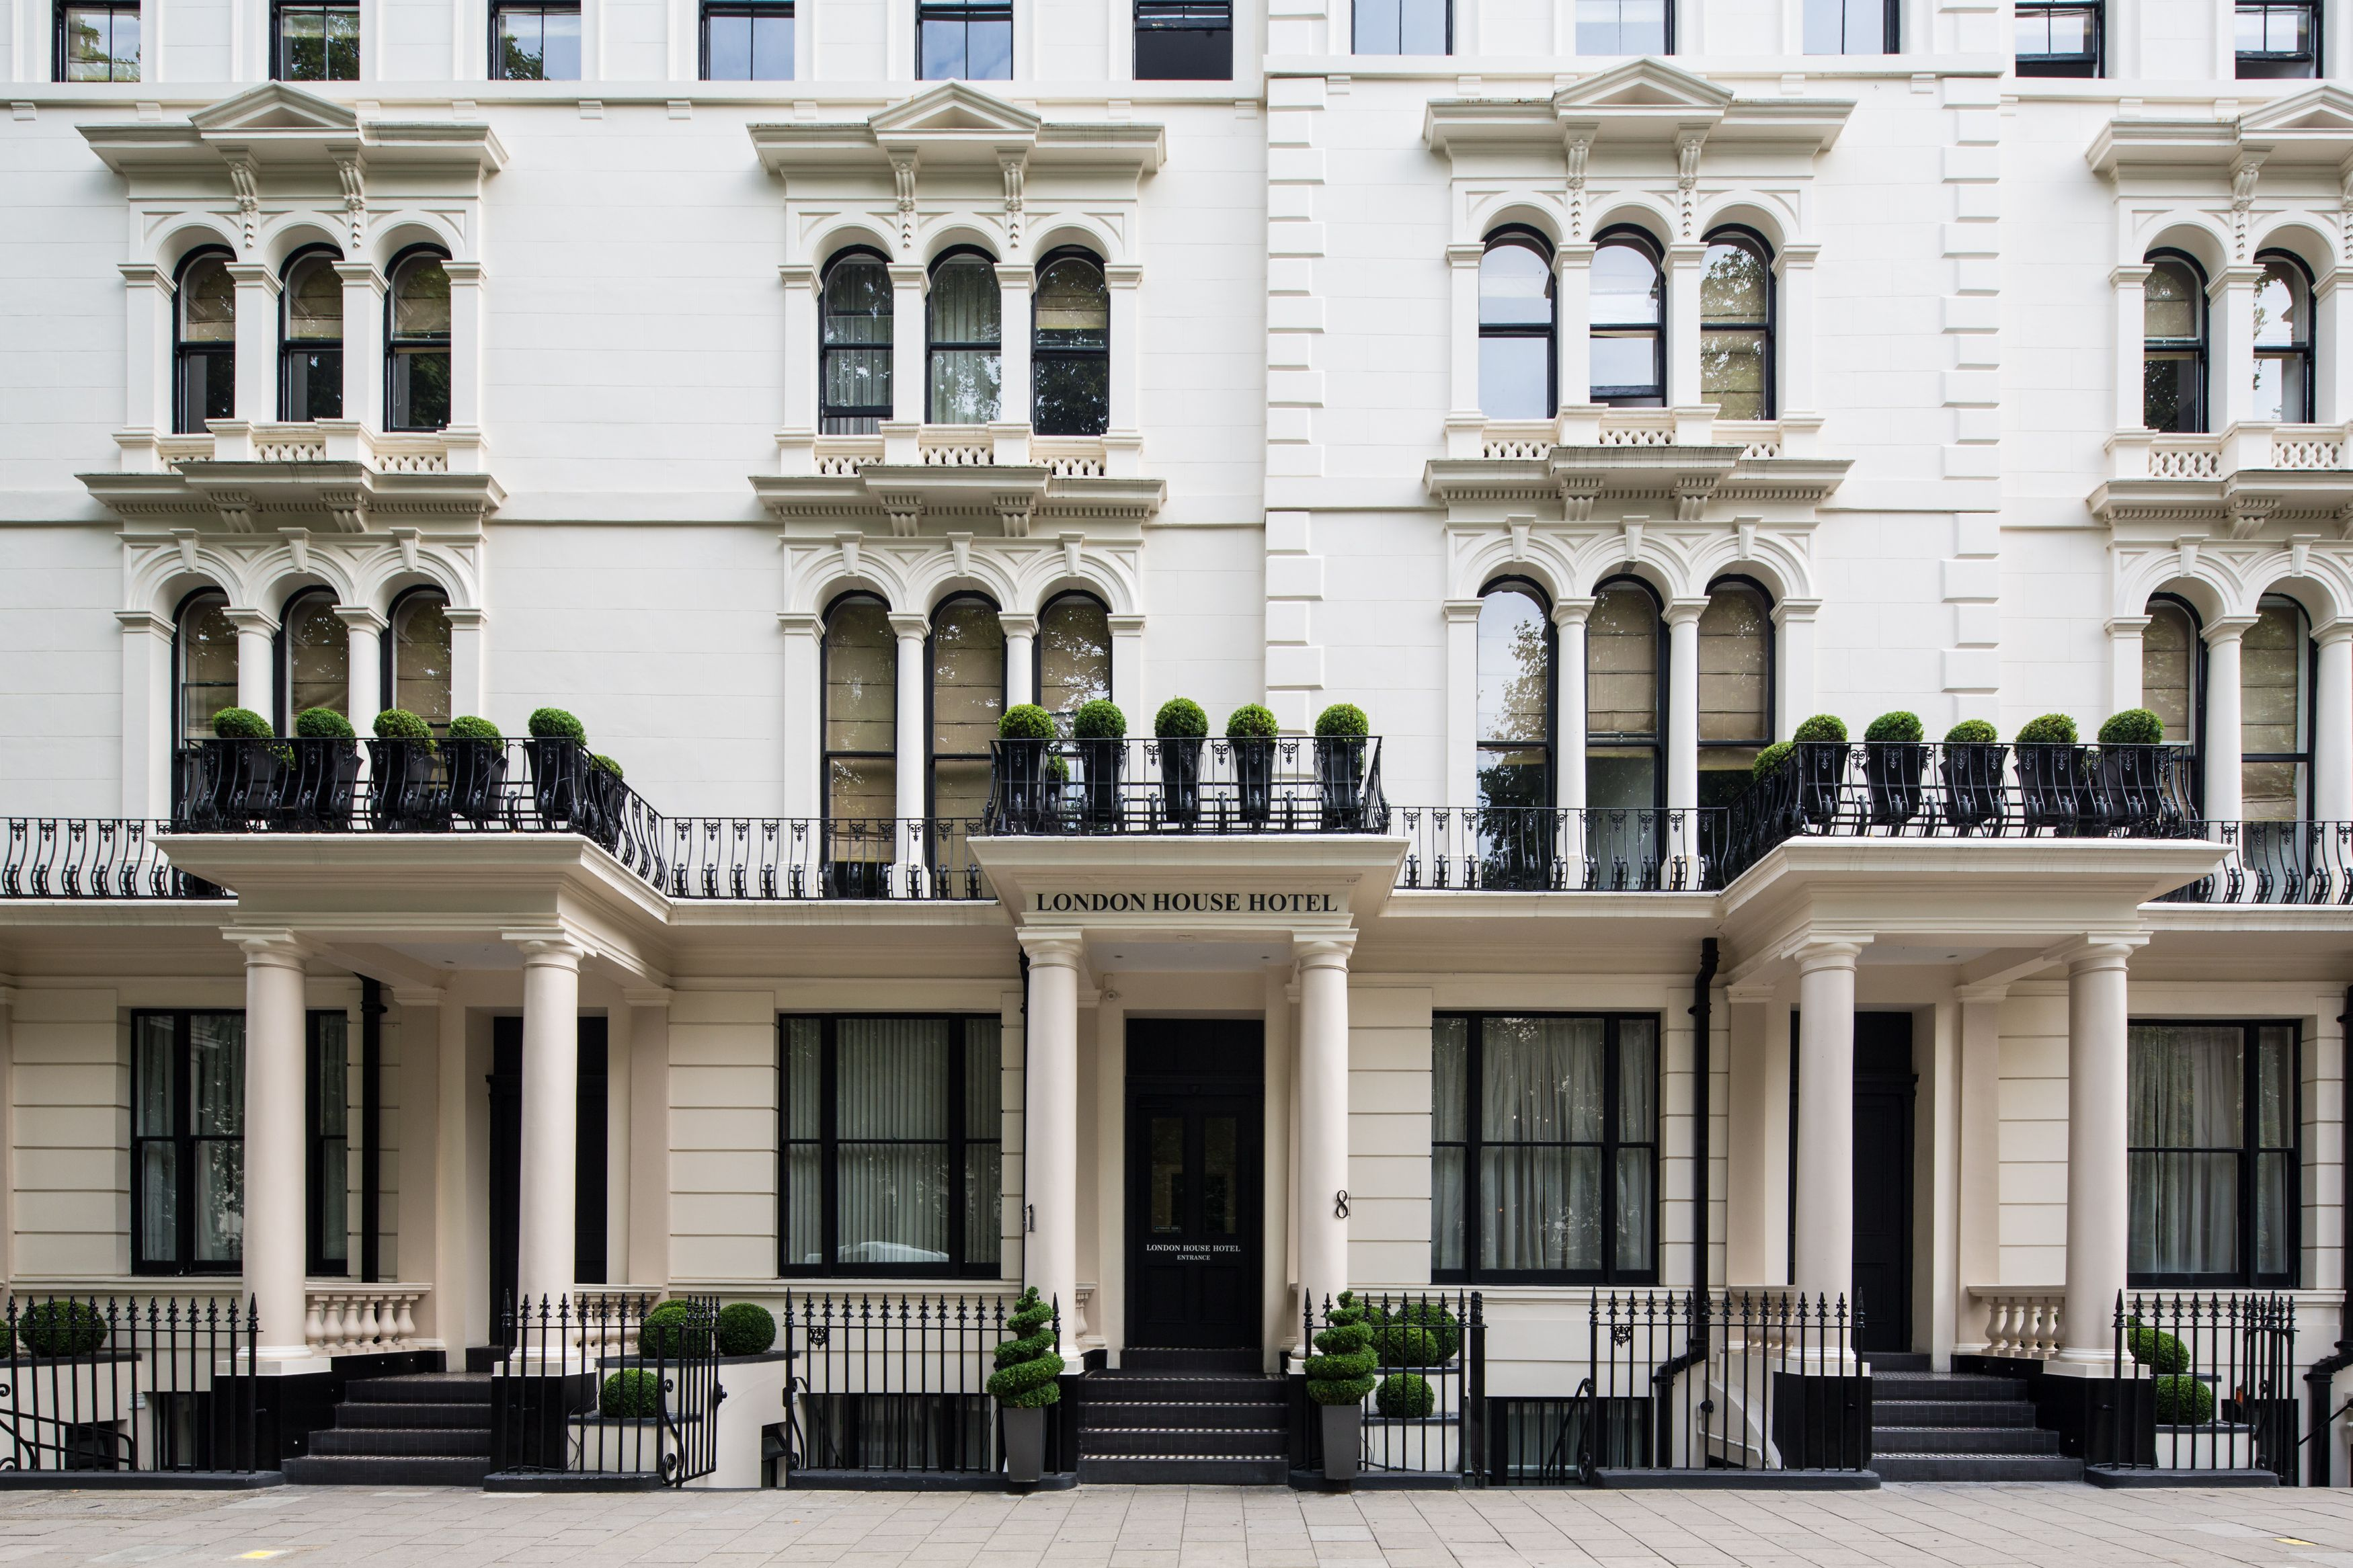 55f1ce5e39c556fb561555c3cdacf062 - London House Hotel Kensington 81 Kensington Gardens Square